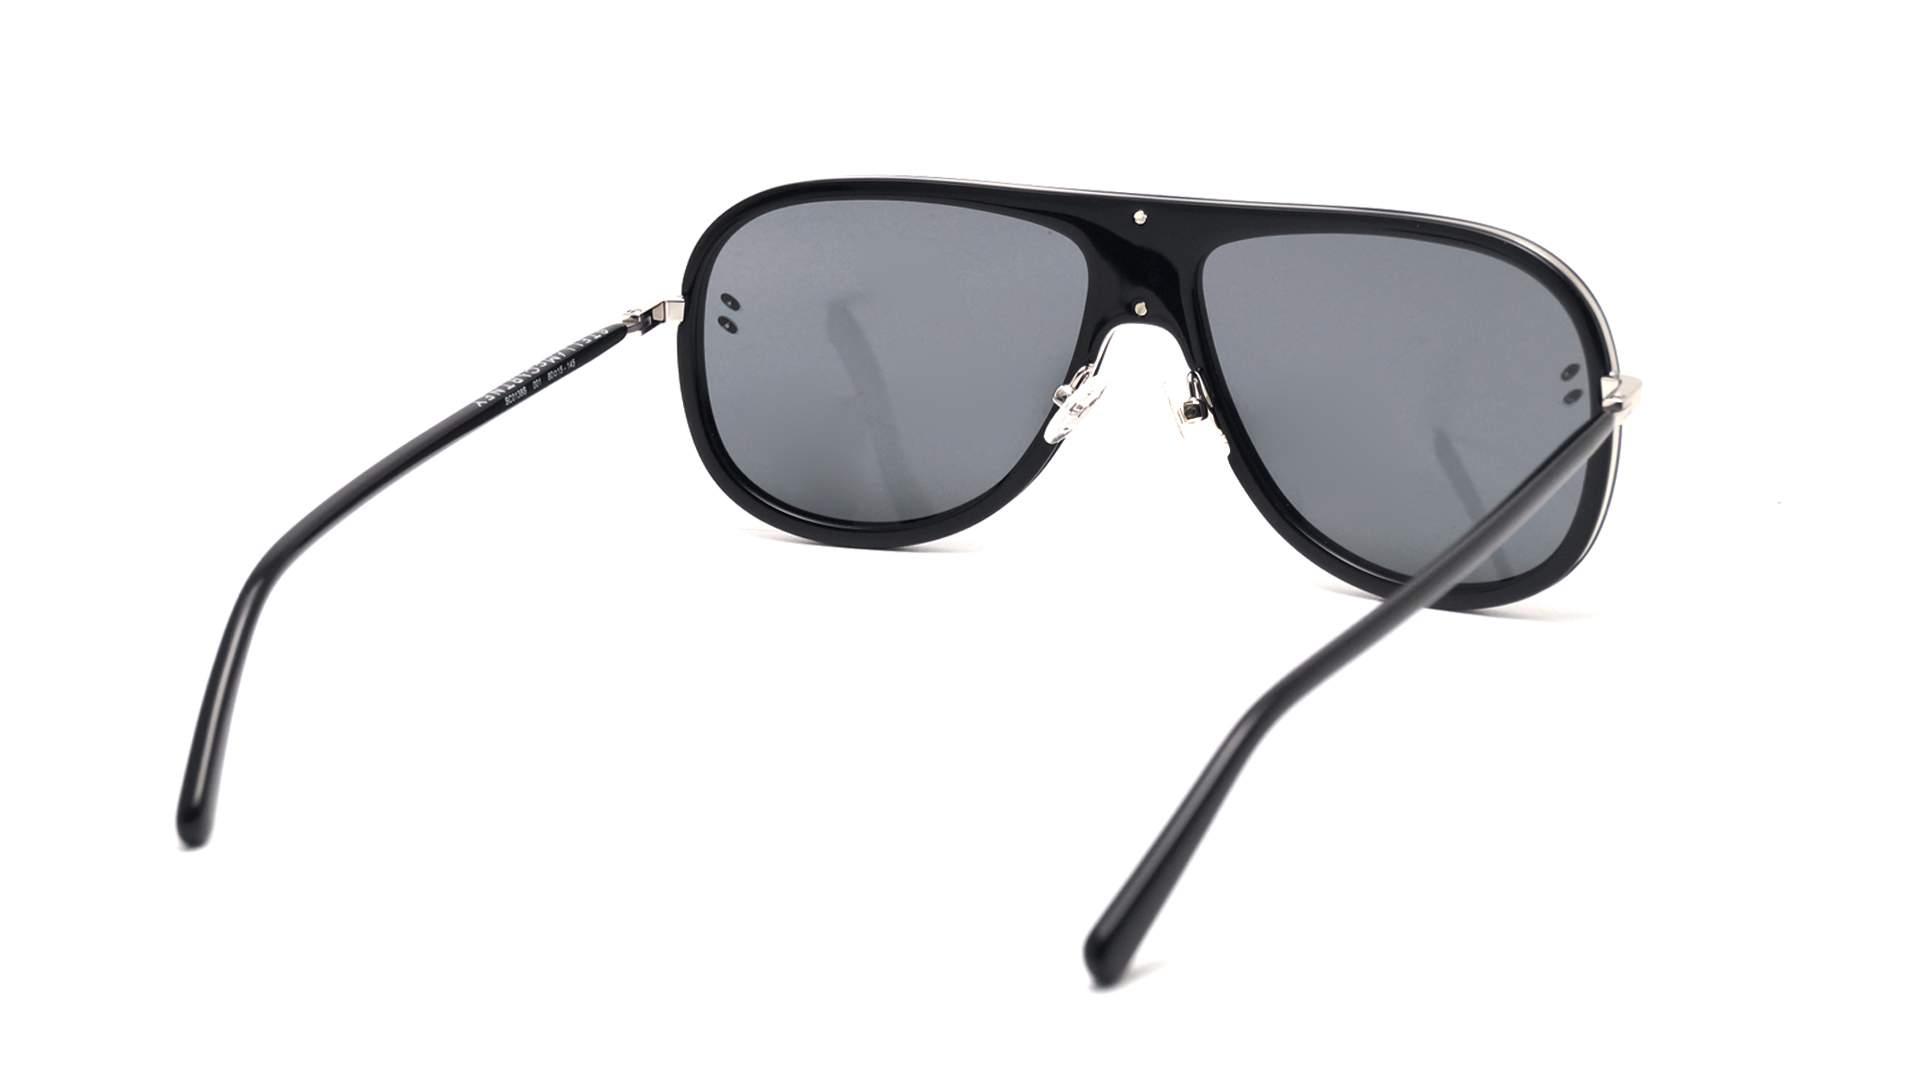 1d6e95a2cd1ee Sunglasses Stella mccartney SC0138S 1 60-15 Black Large